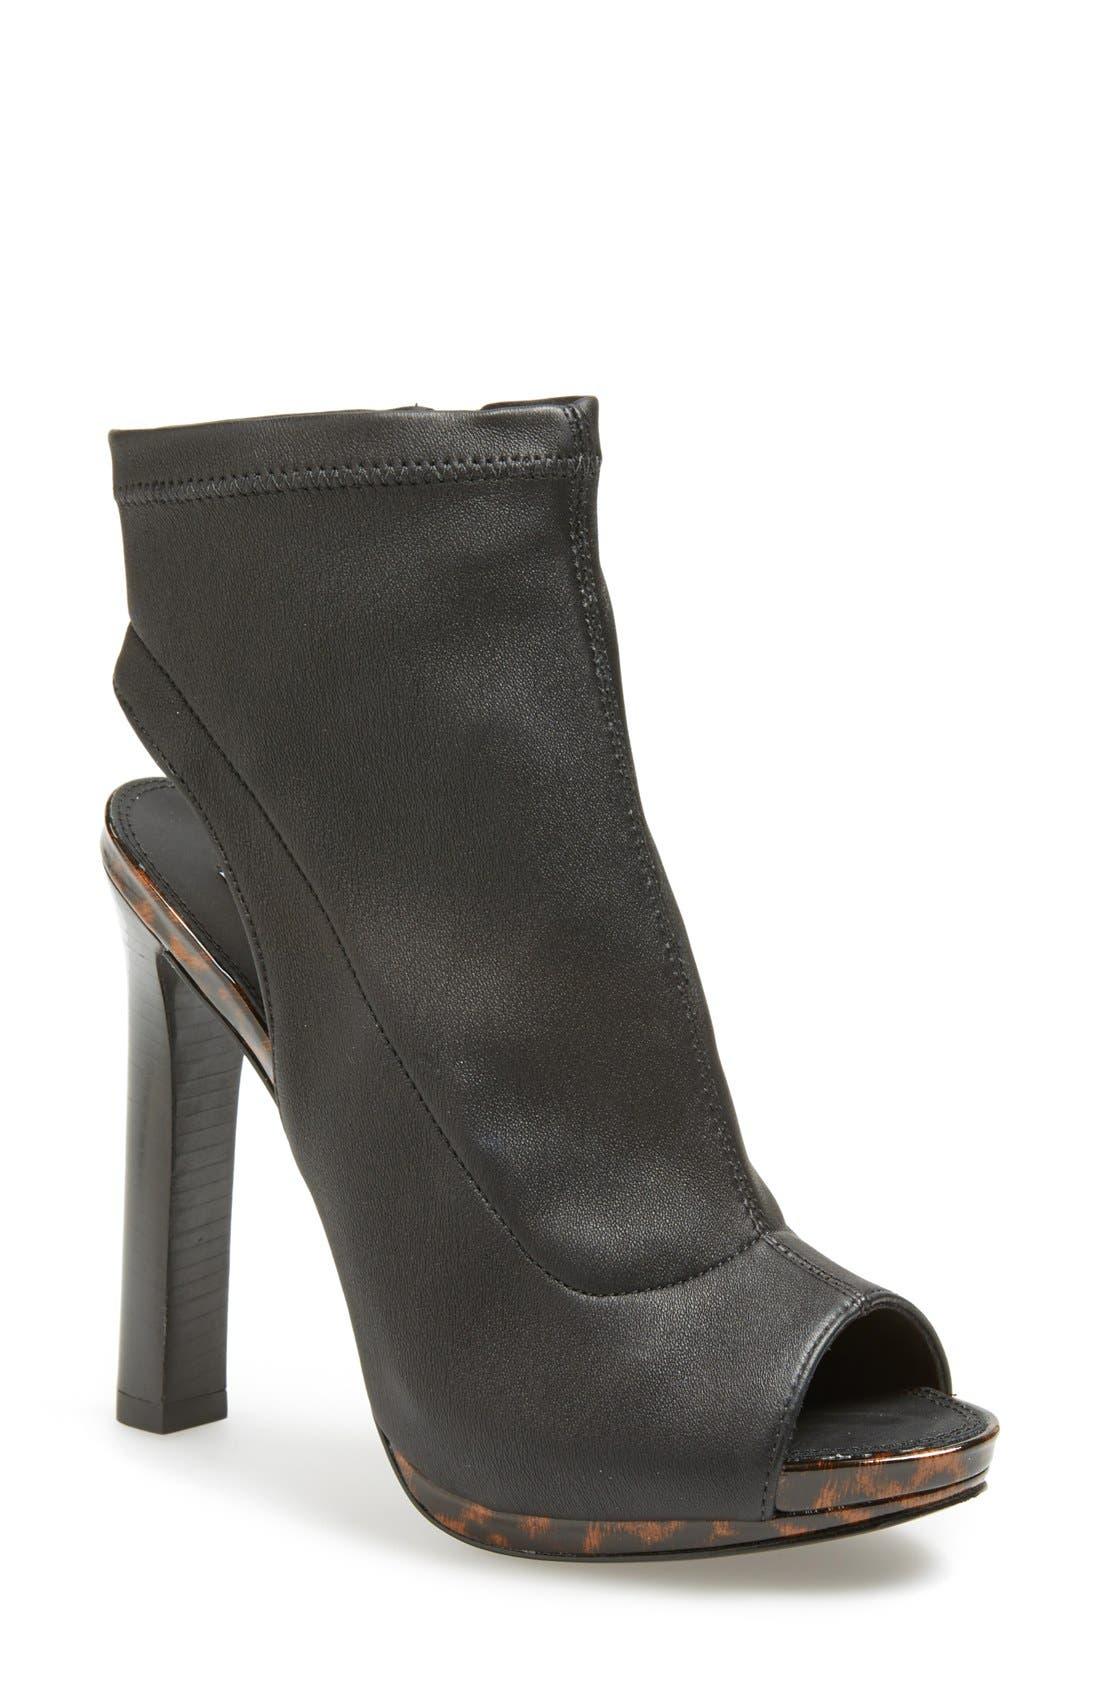 Alternate Image 1 Selected - Diane von Furstenberg 'Armara' Peep Toe Stretch Leather Bootie (Women)